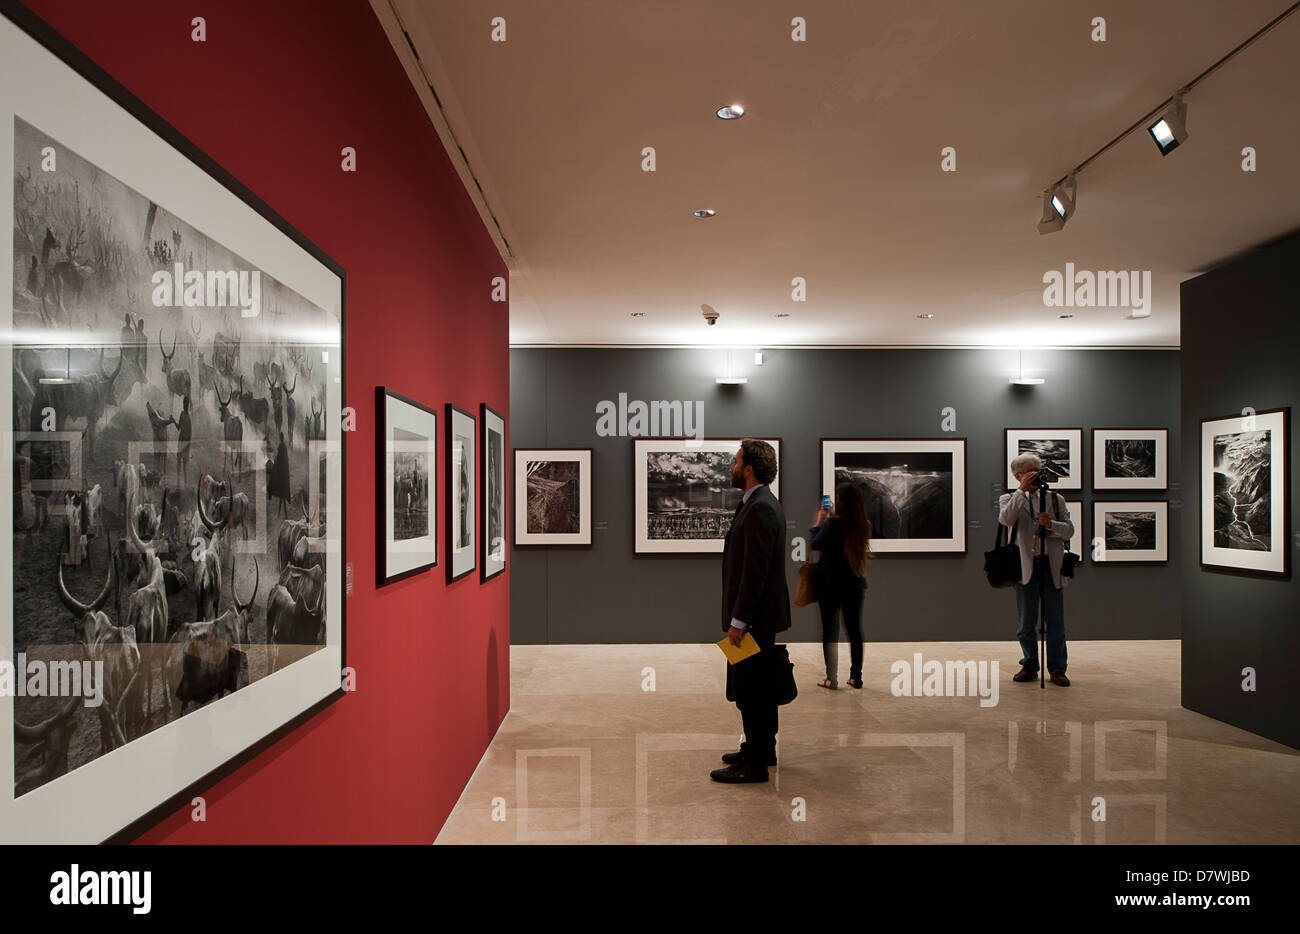 Exhibition 'Genesis' of the Brazilian Photographer Sebastiao Salgado. Ara Pacis Museum, Rome, Italy. - Stock Image